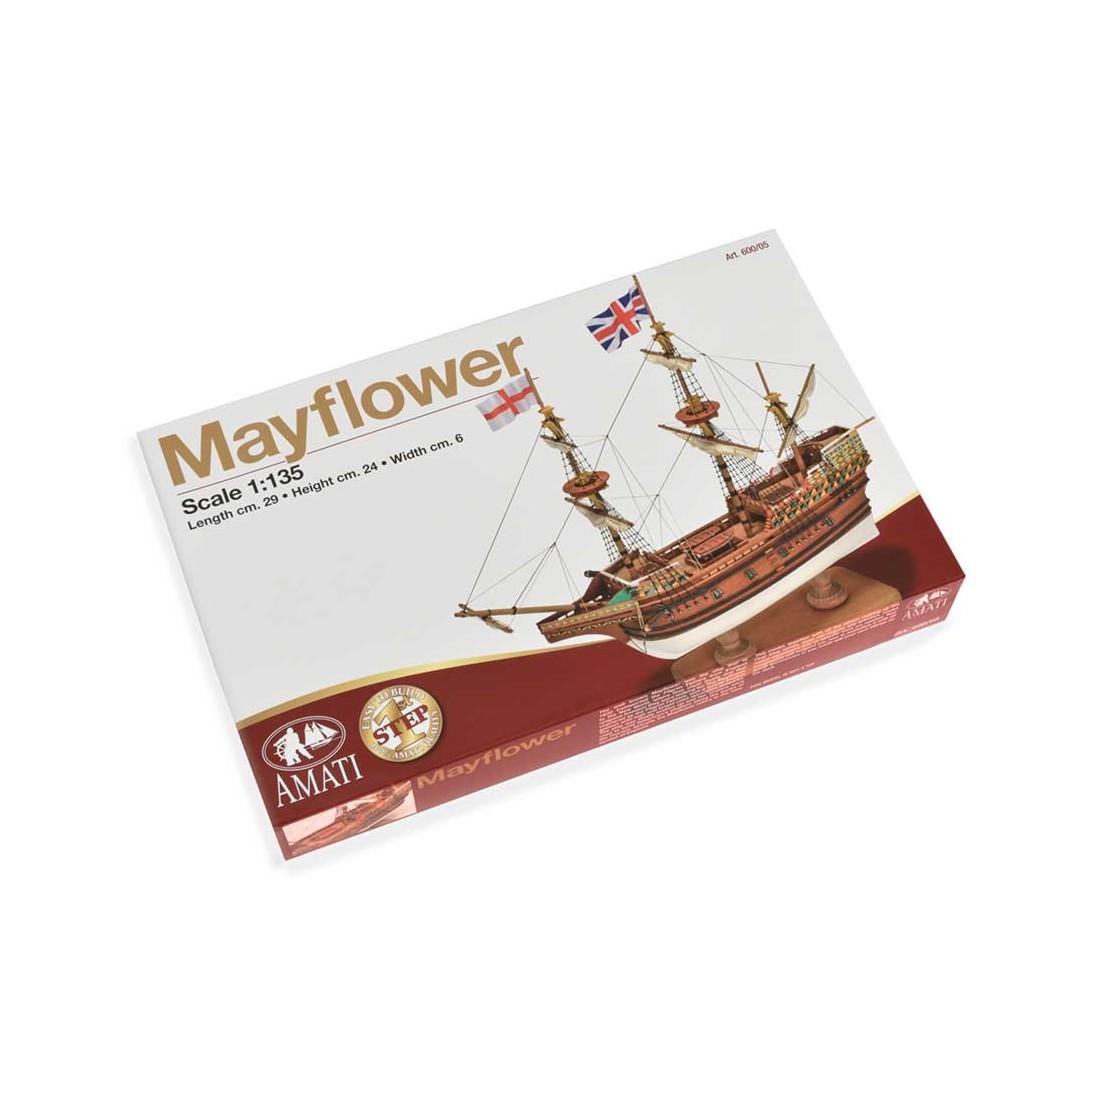 Scatola montaggio Mayflower - First Step